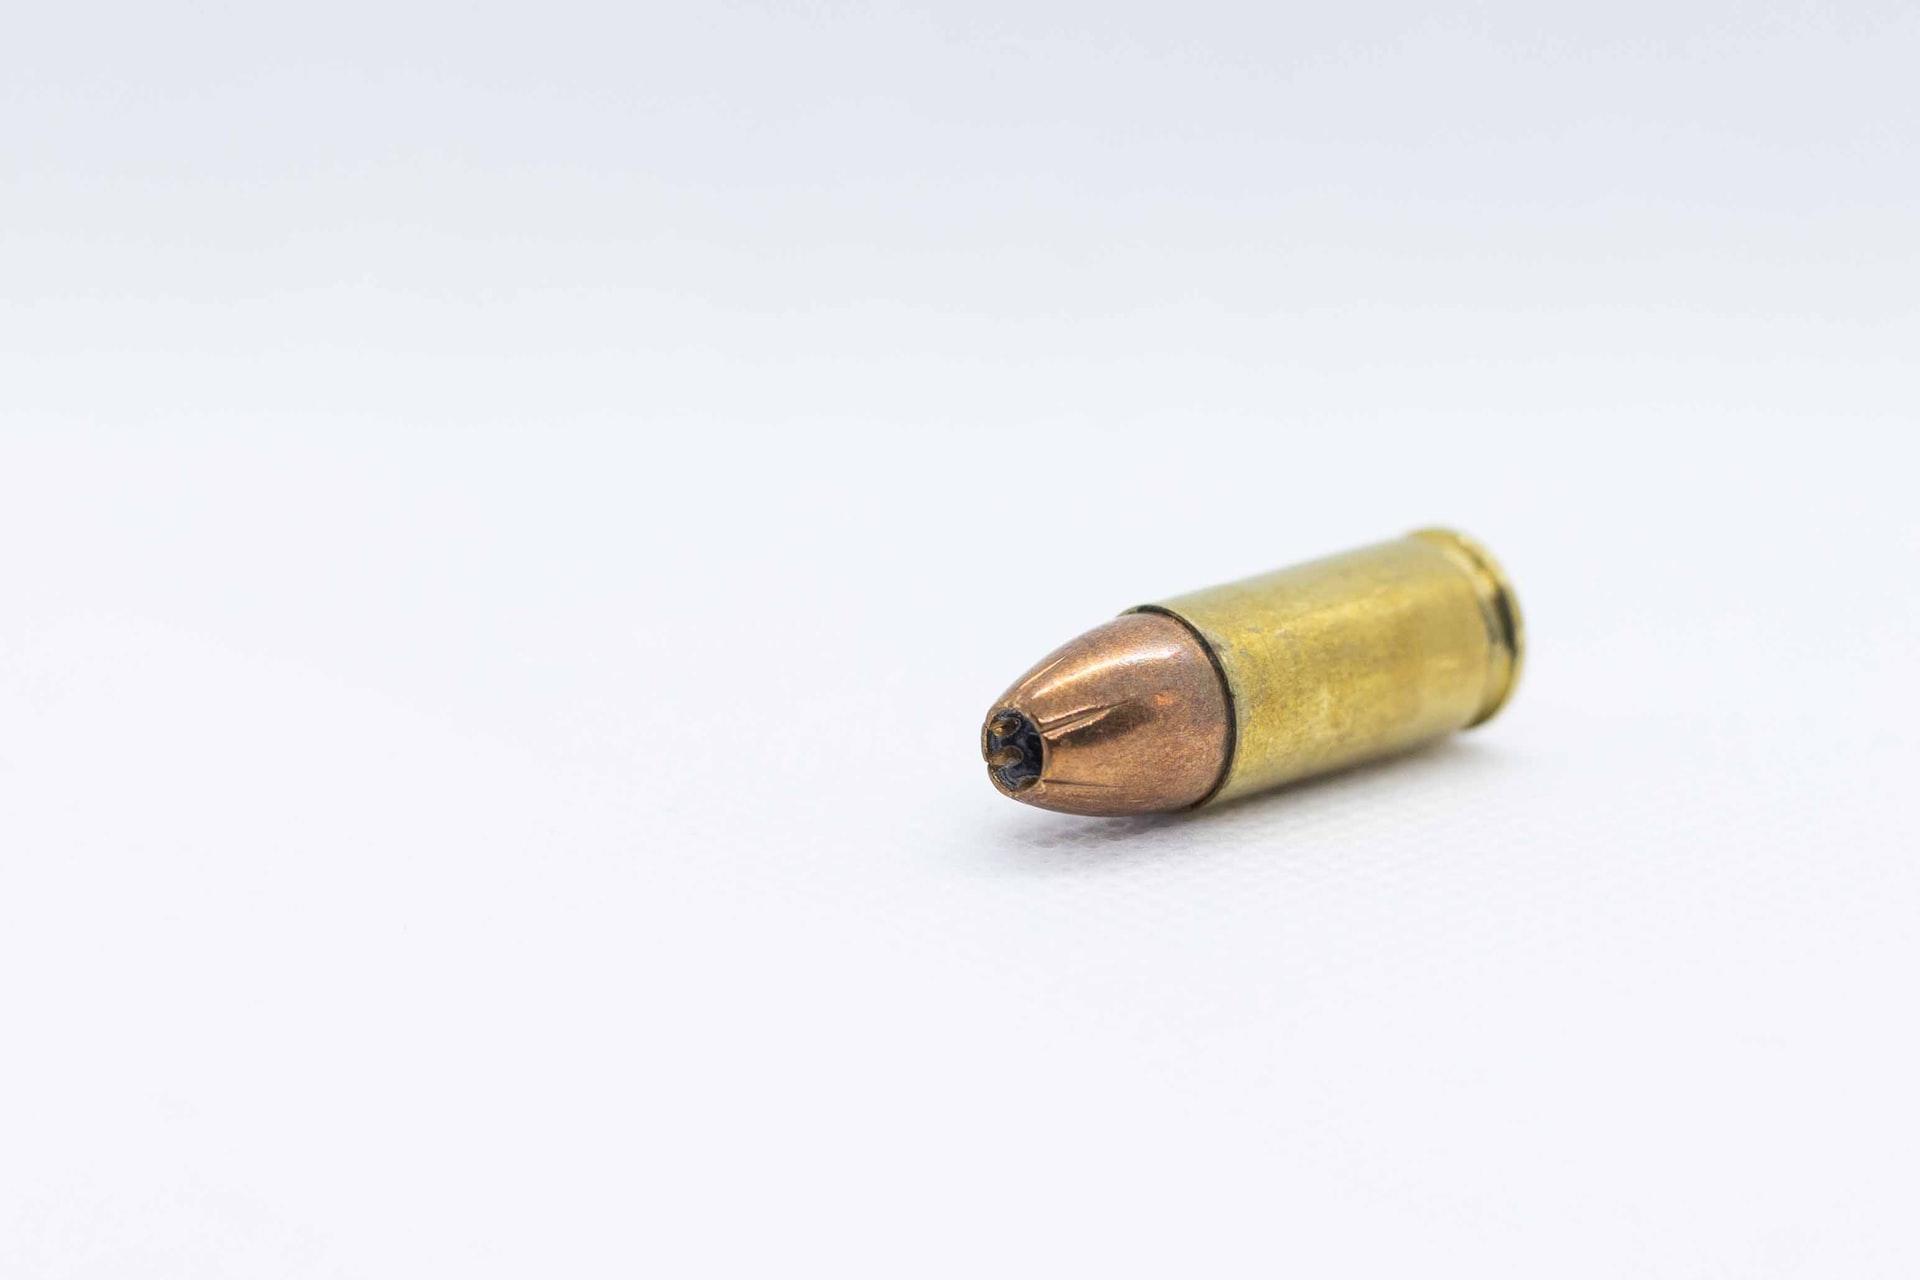 Ivermectin silver bullet